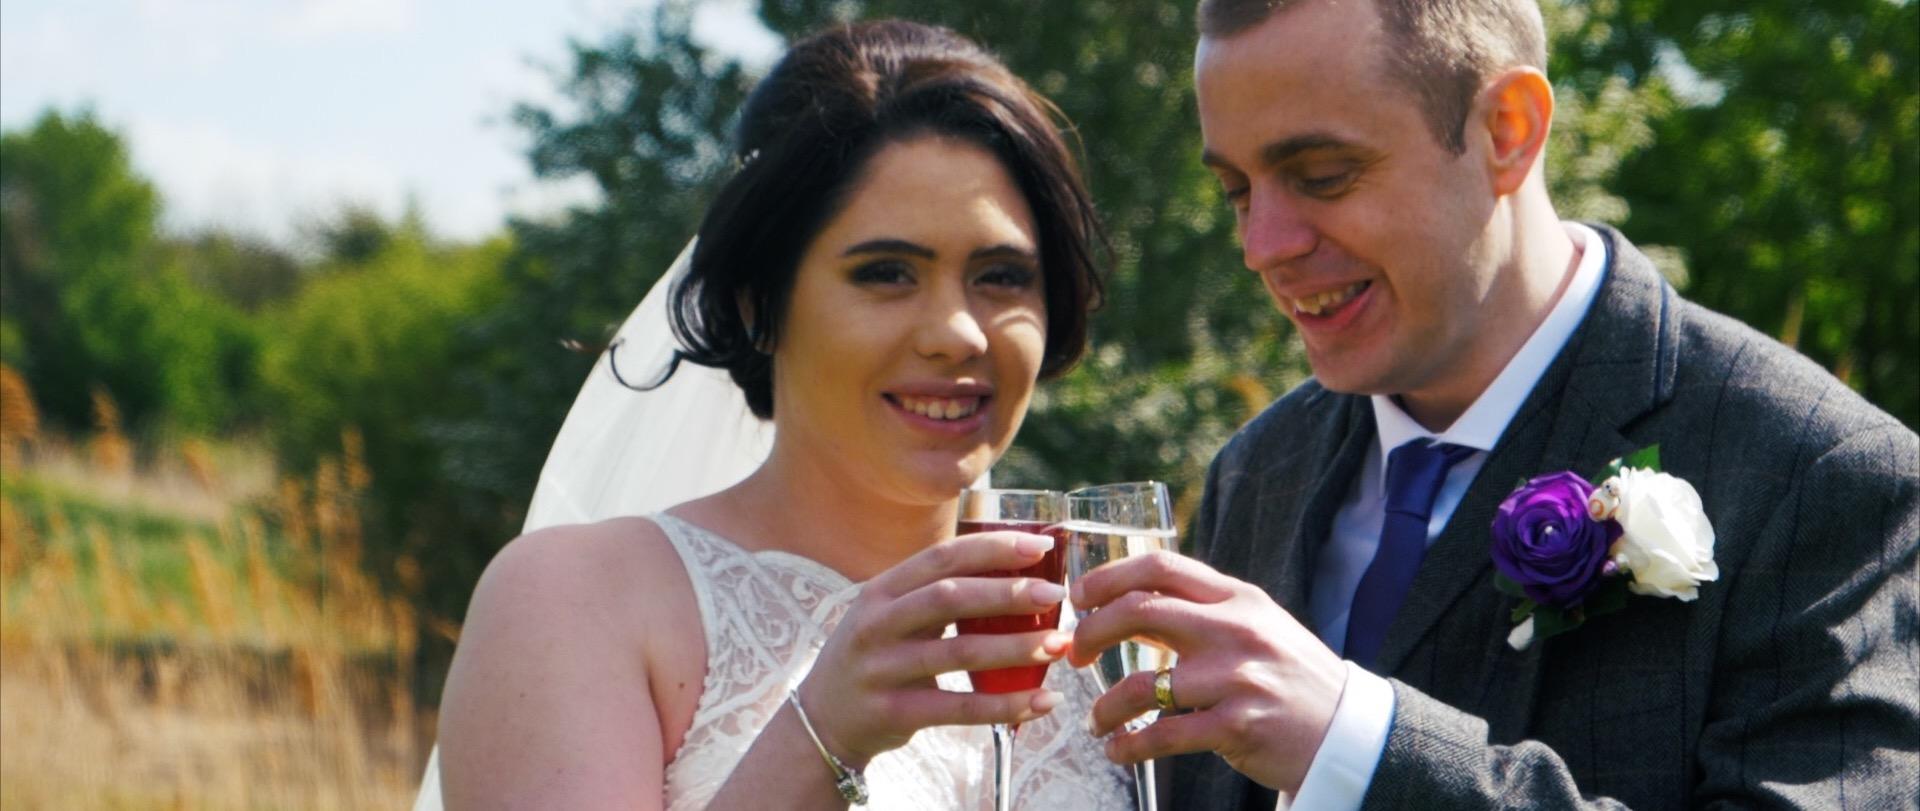 Cromwell Manor Wedding Videos.jpg